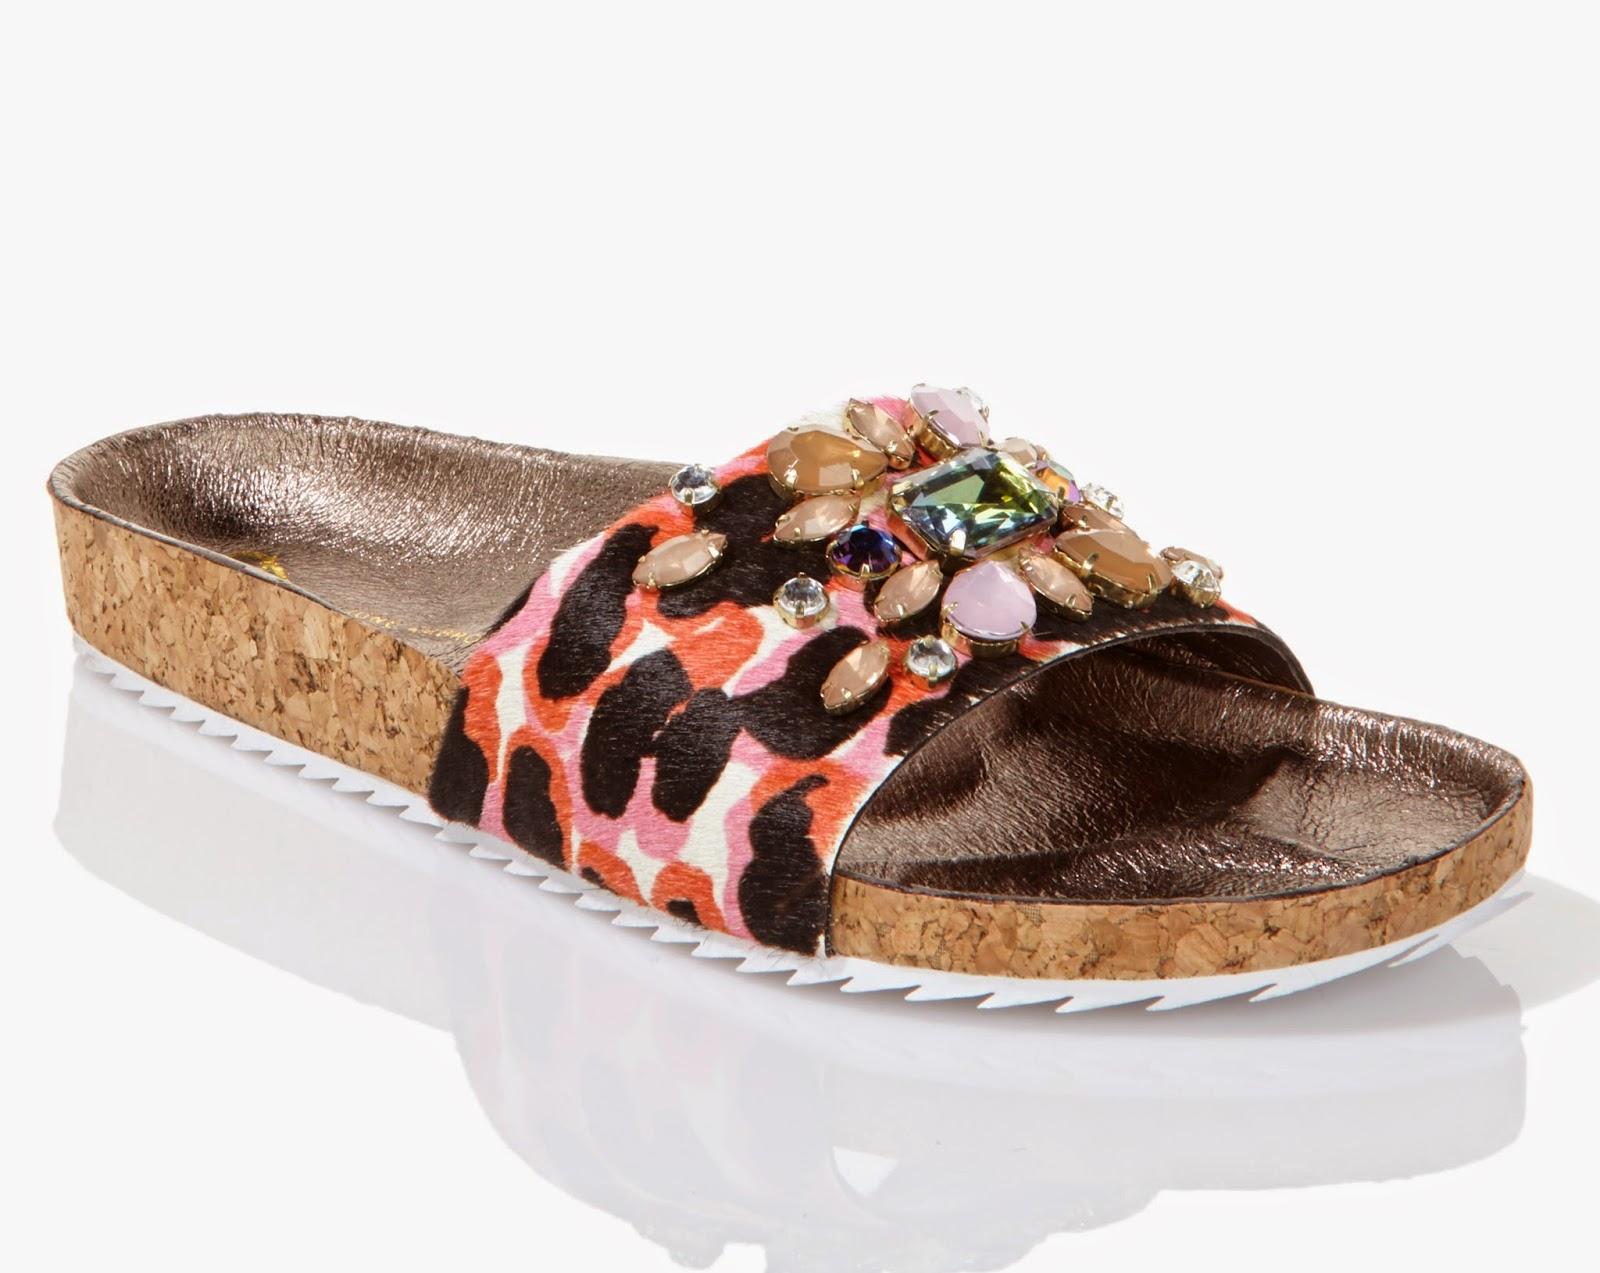 June Ambrose for HSN jeweled flat sandal